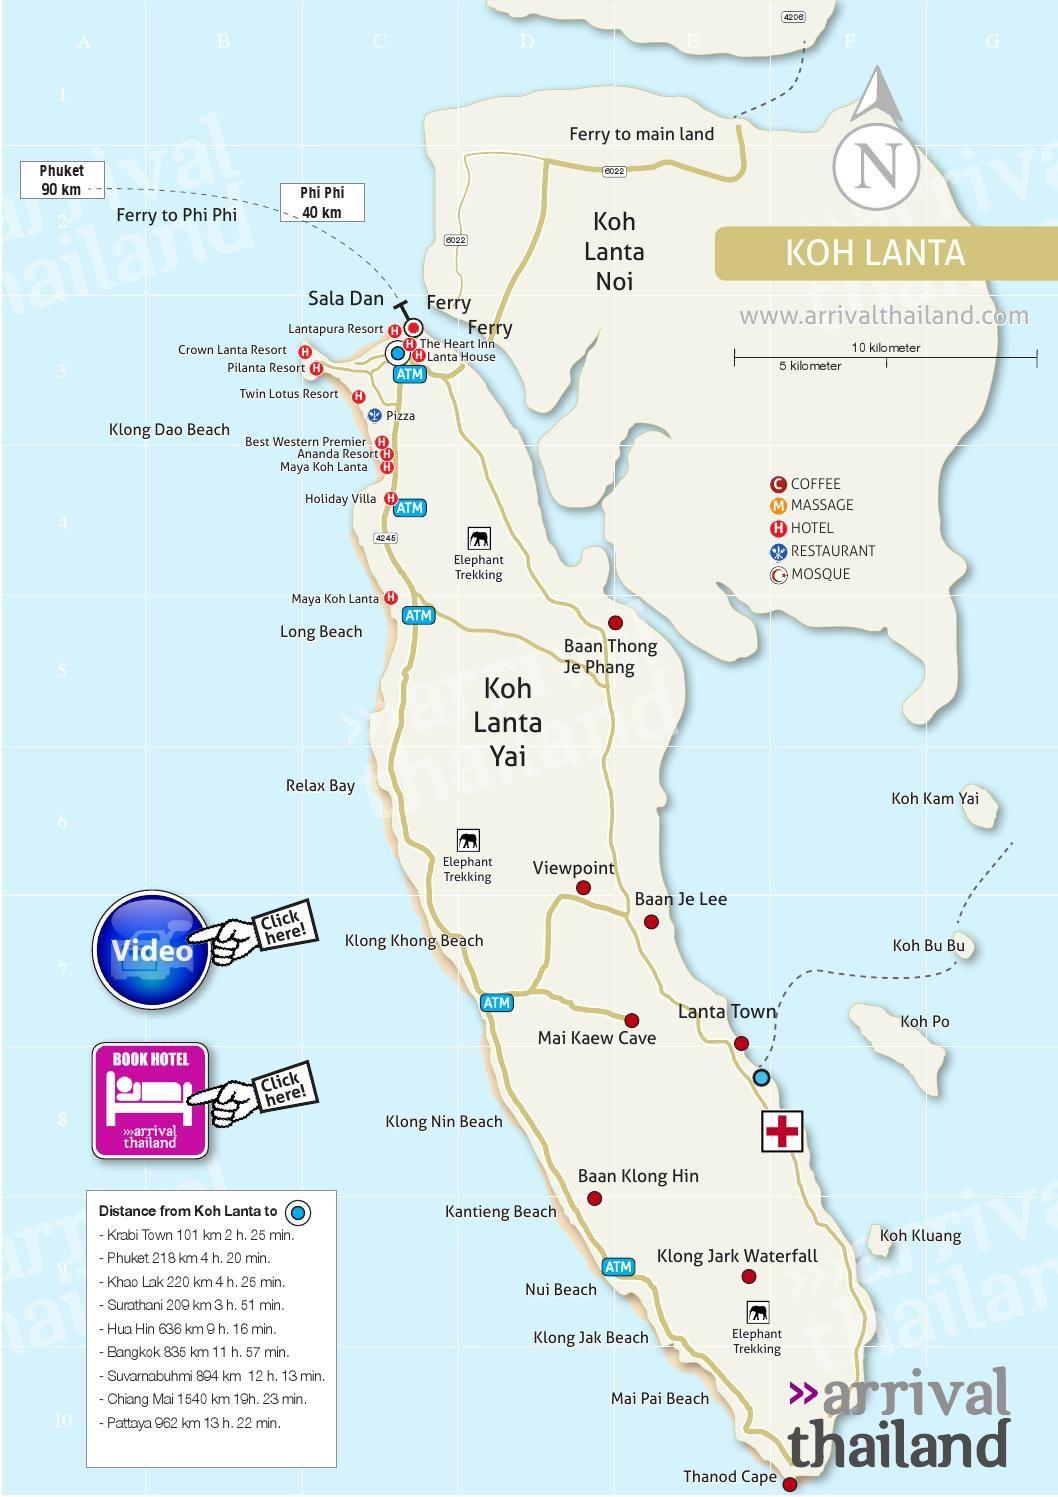 Arrival Thailand Koh Lanta map in 2020 Thailand travel